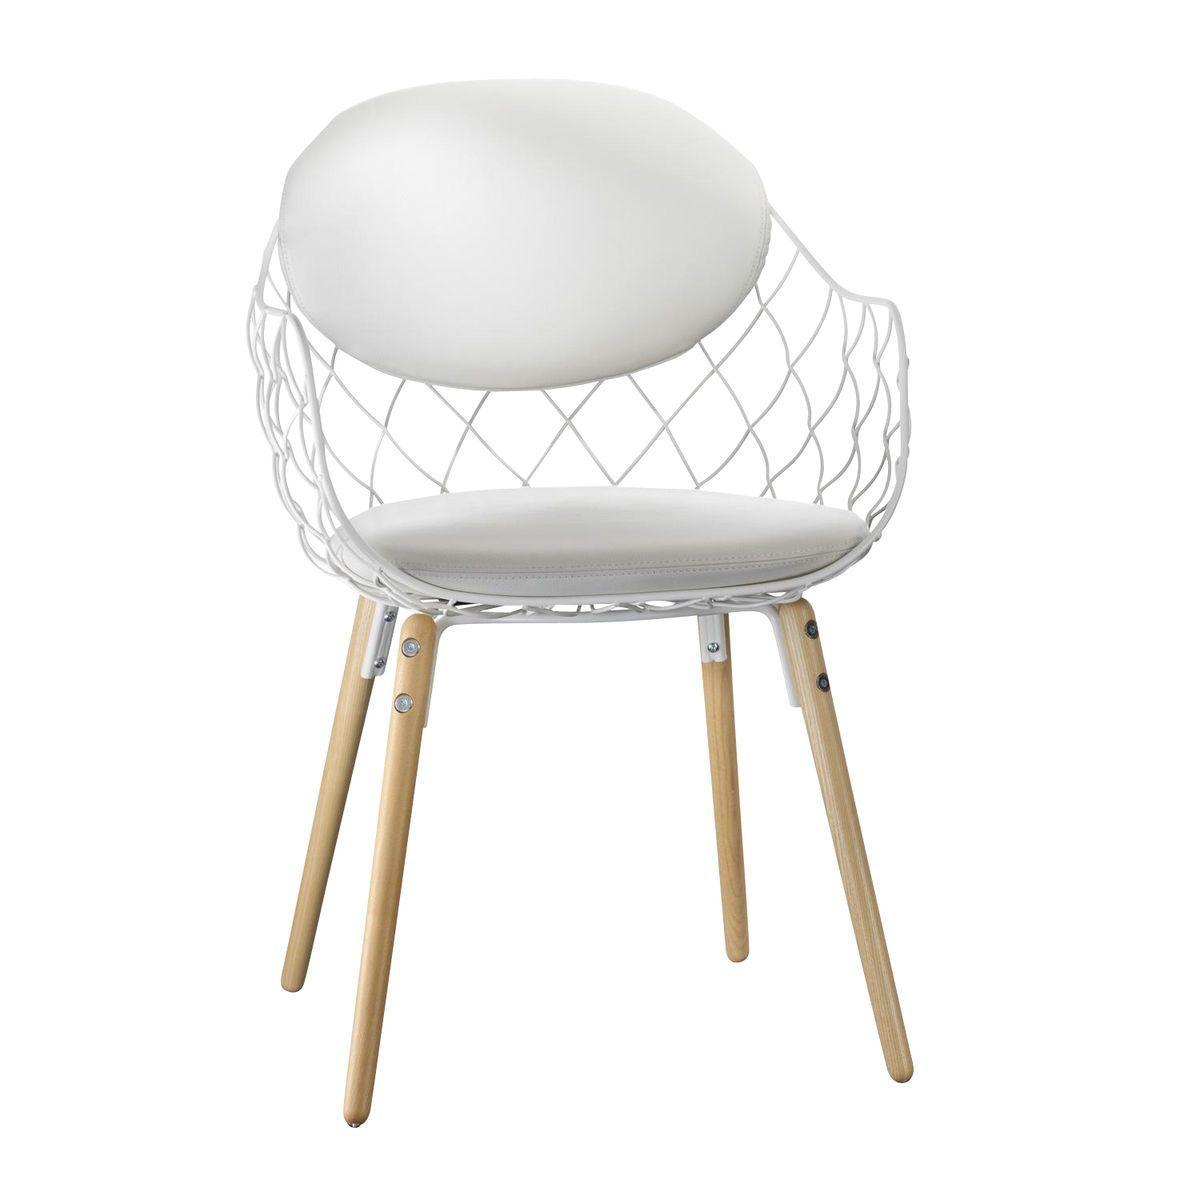 Pi a chair leather magis for Sedia particolare